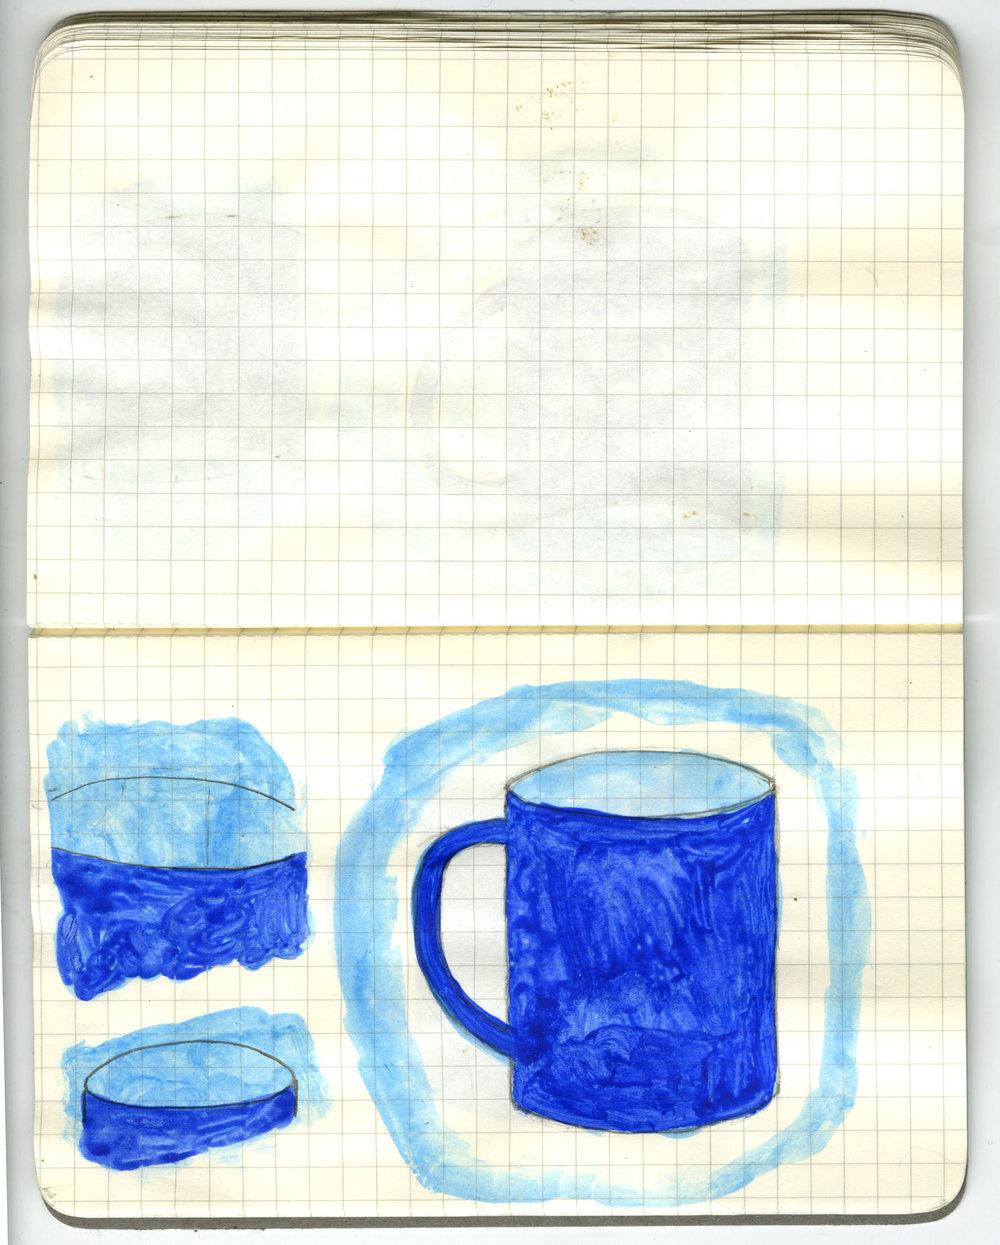 cup025.jpg